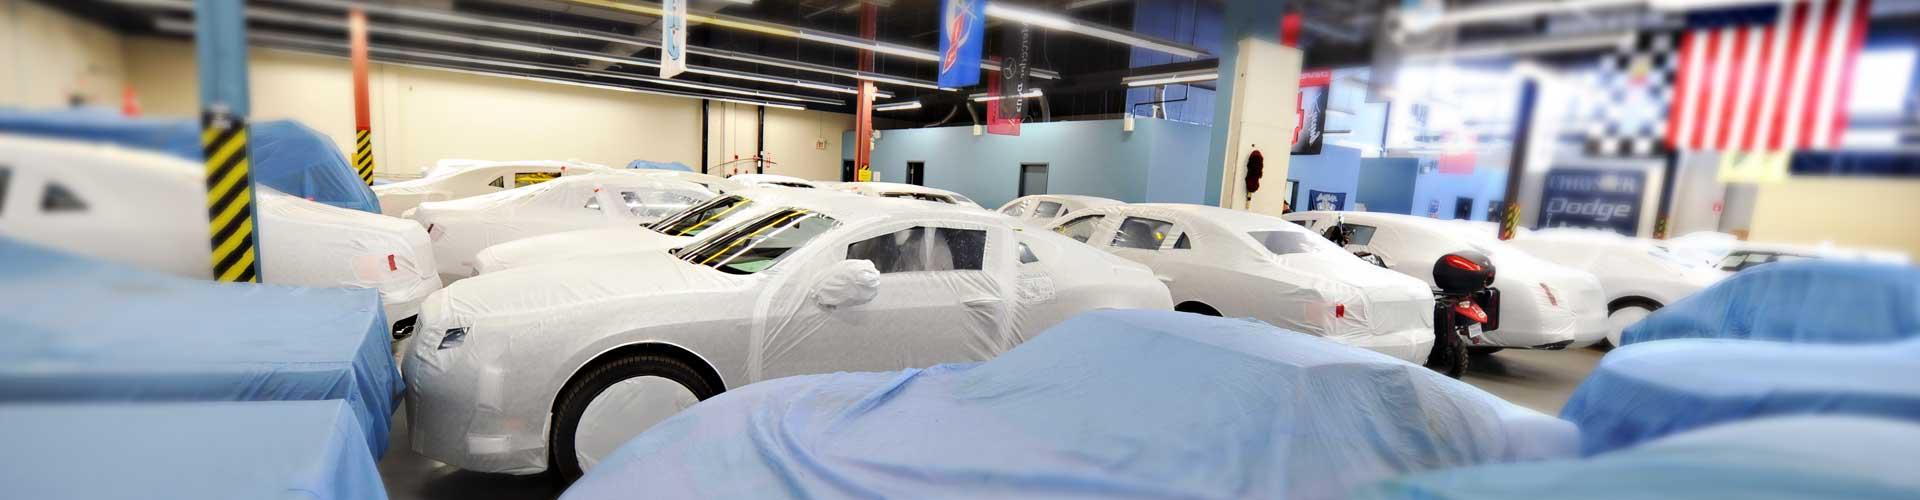 Car Storage Facilities In Toronto Tfx International